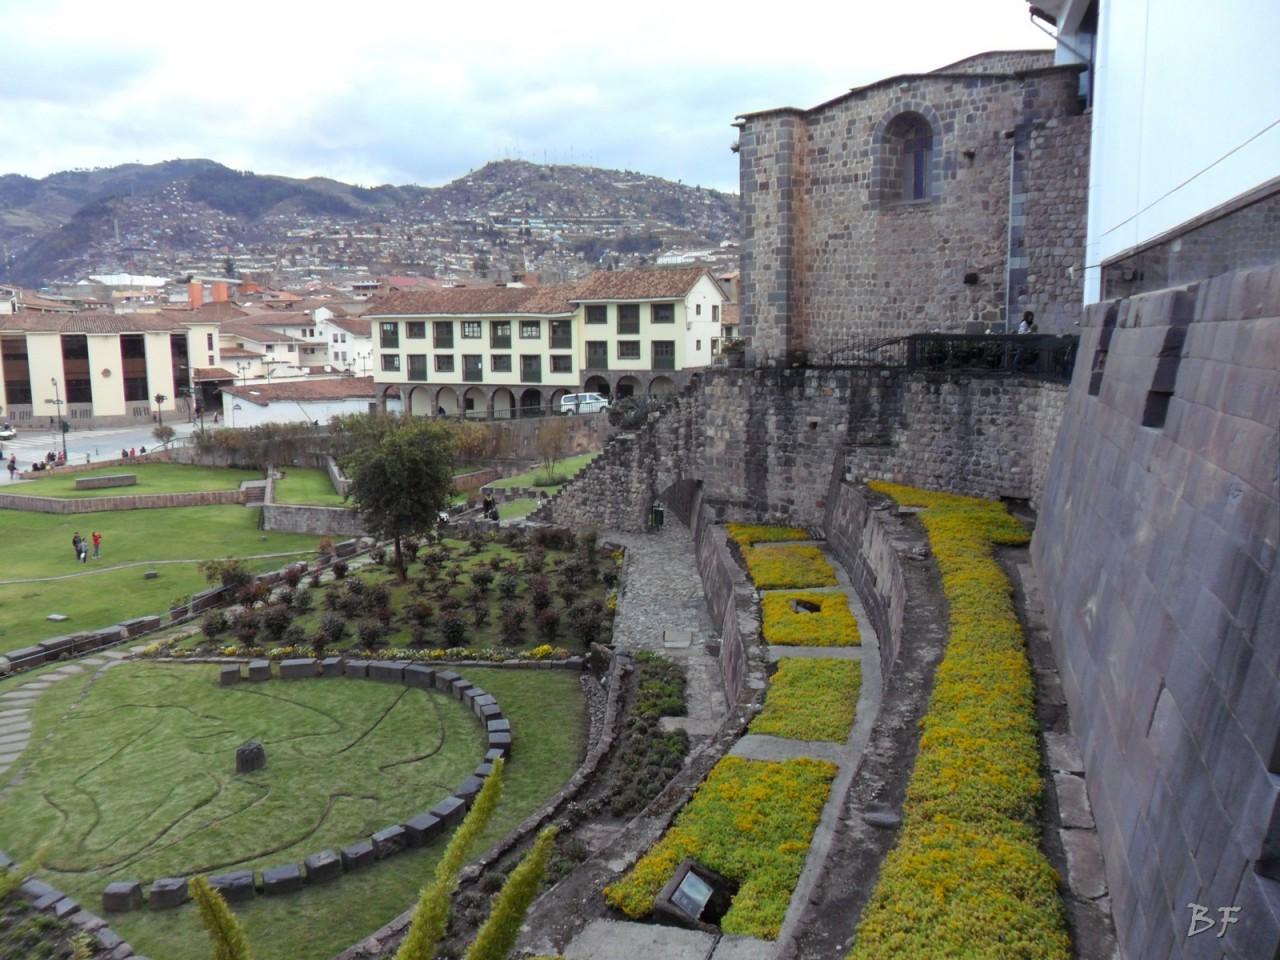 Mura-Poligonali-Megaliti-Tempio-Coricancha-Cusco-Perù-45